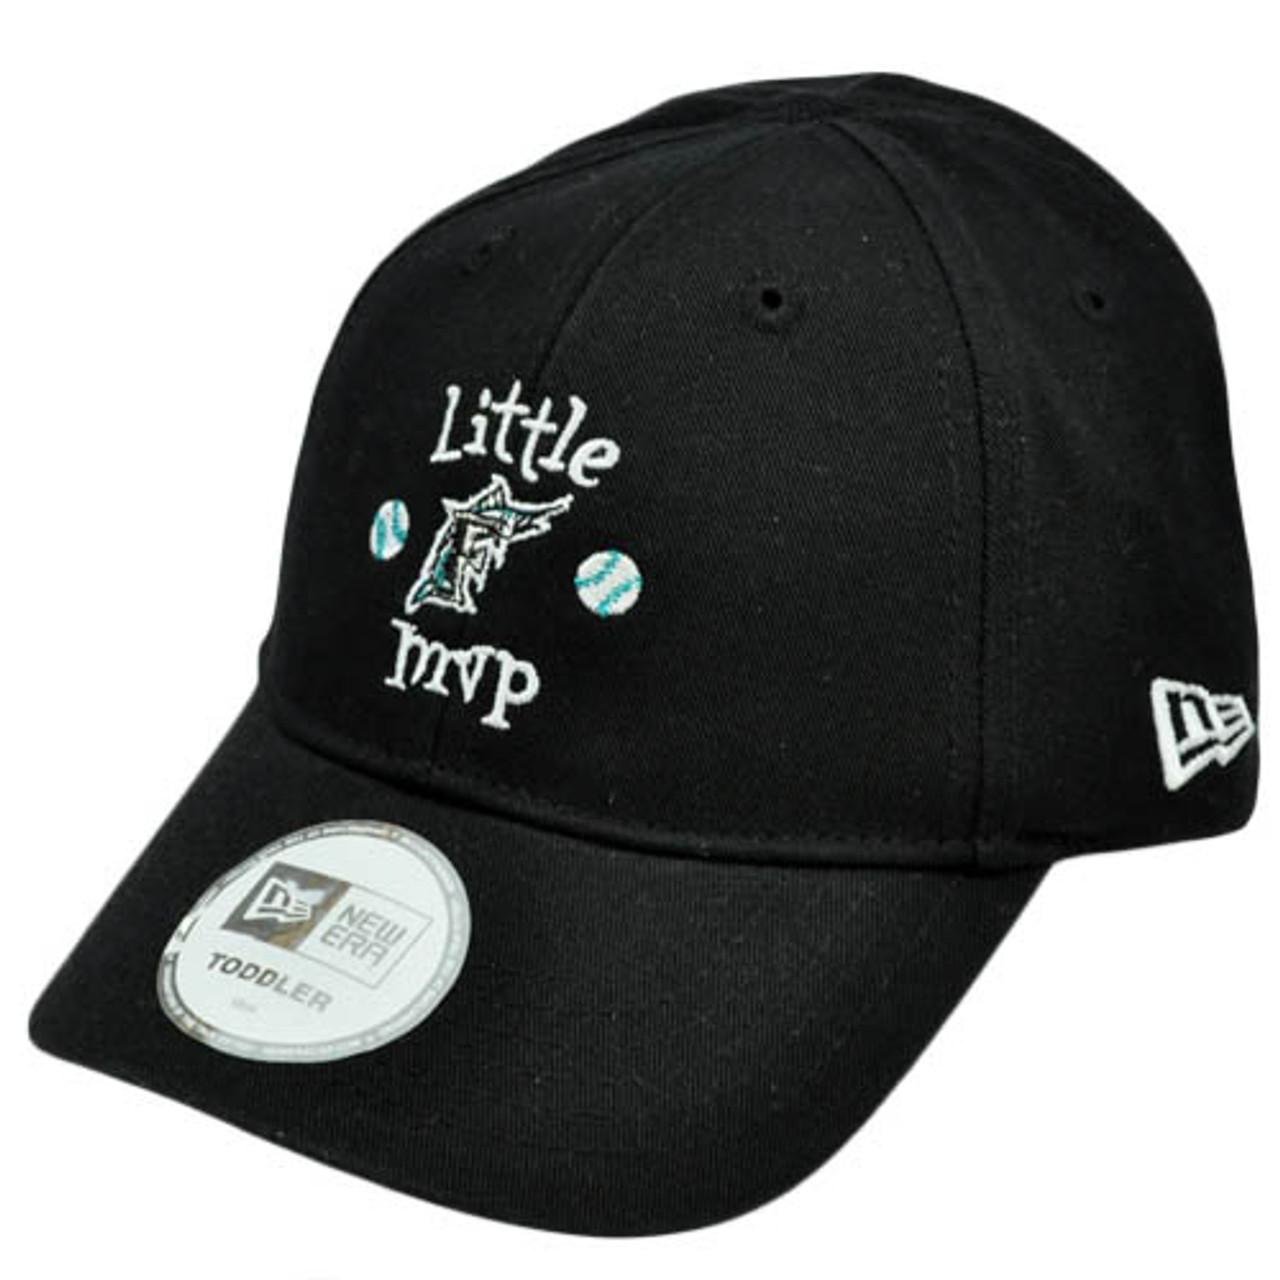 wholesale dealer c3432 7d90a MLB Florida Marlins Little MVP Youth Toddler Baby Boy Black Stretch Band  Hat Cap - Sinbad Sports Store